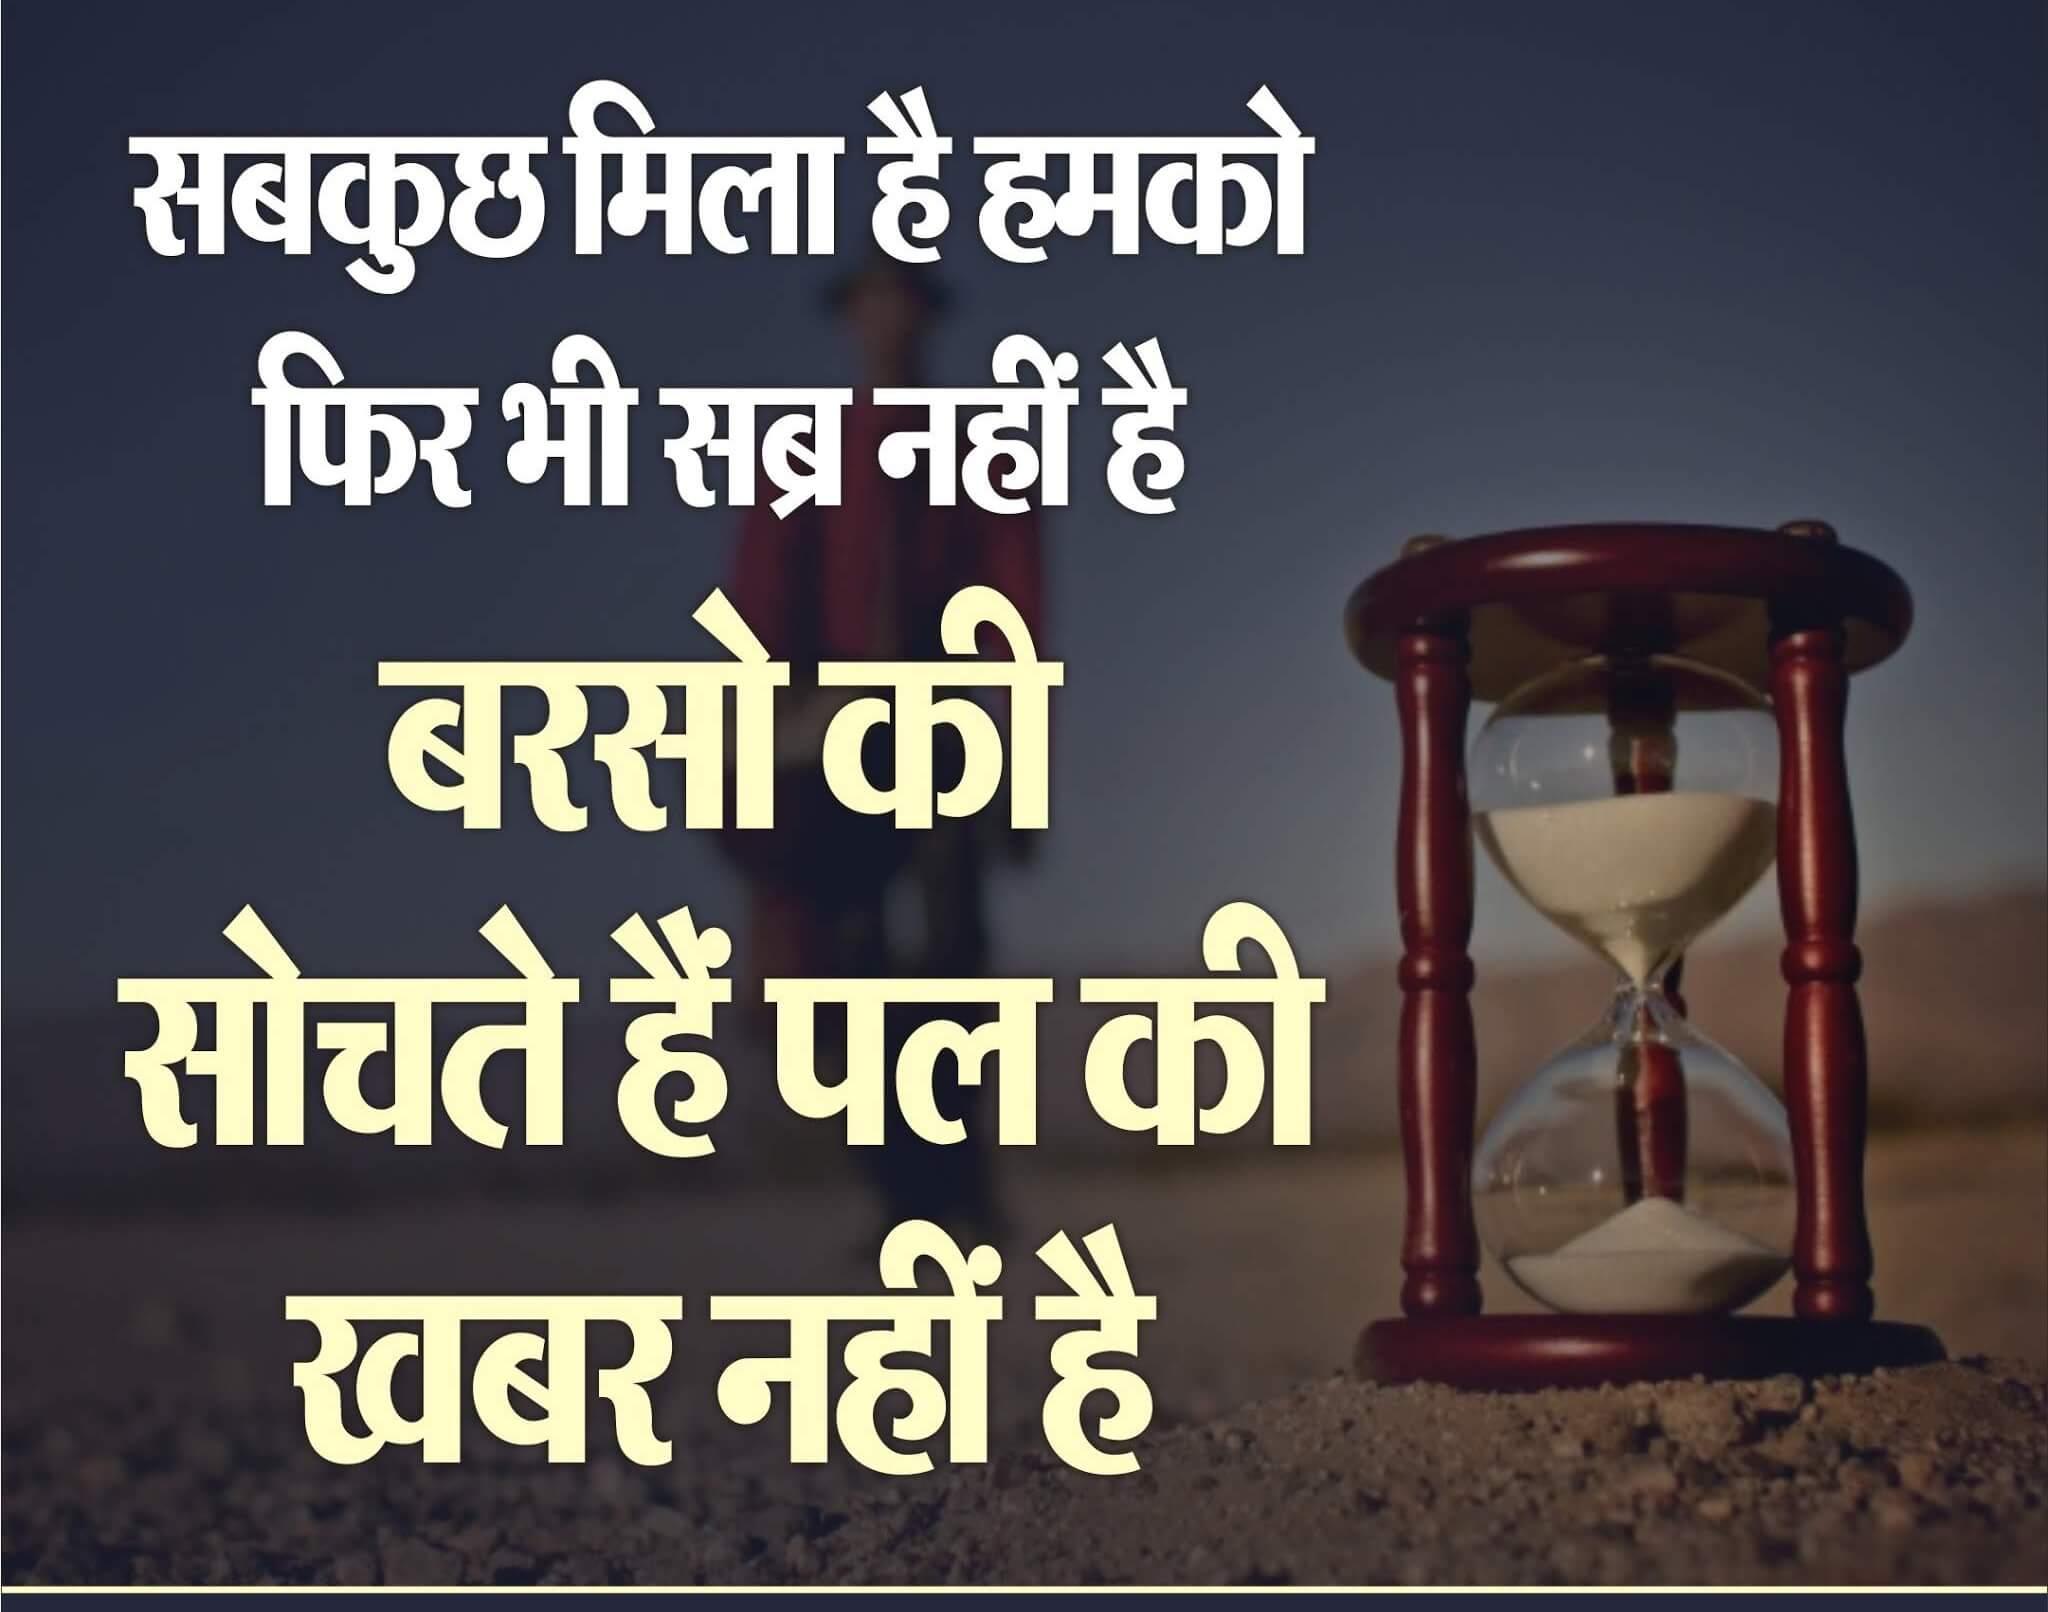 "Hindi Motivational Quotes And Thoughts À¤¹ À¤¨ À¤¦ À¤® À¤Ÿ À¤µ À¤¶à¤¨à¤² À¤• À¤µ À¤Ÿ À¤¸ À¤""र À¤µ À¤š À¤°"